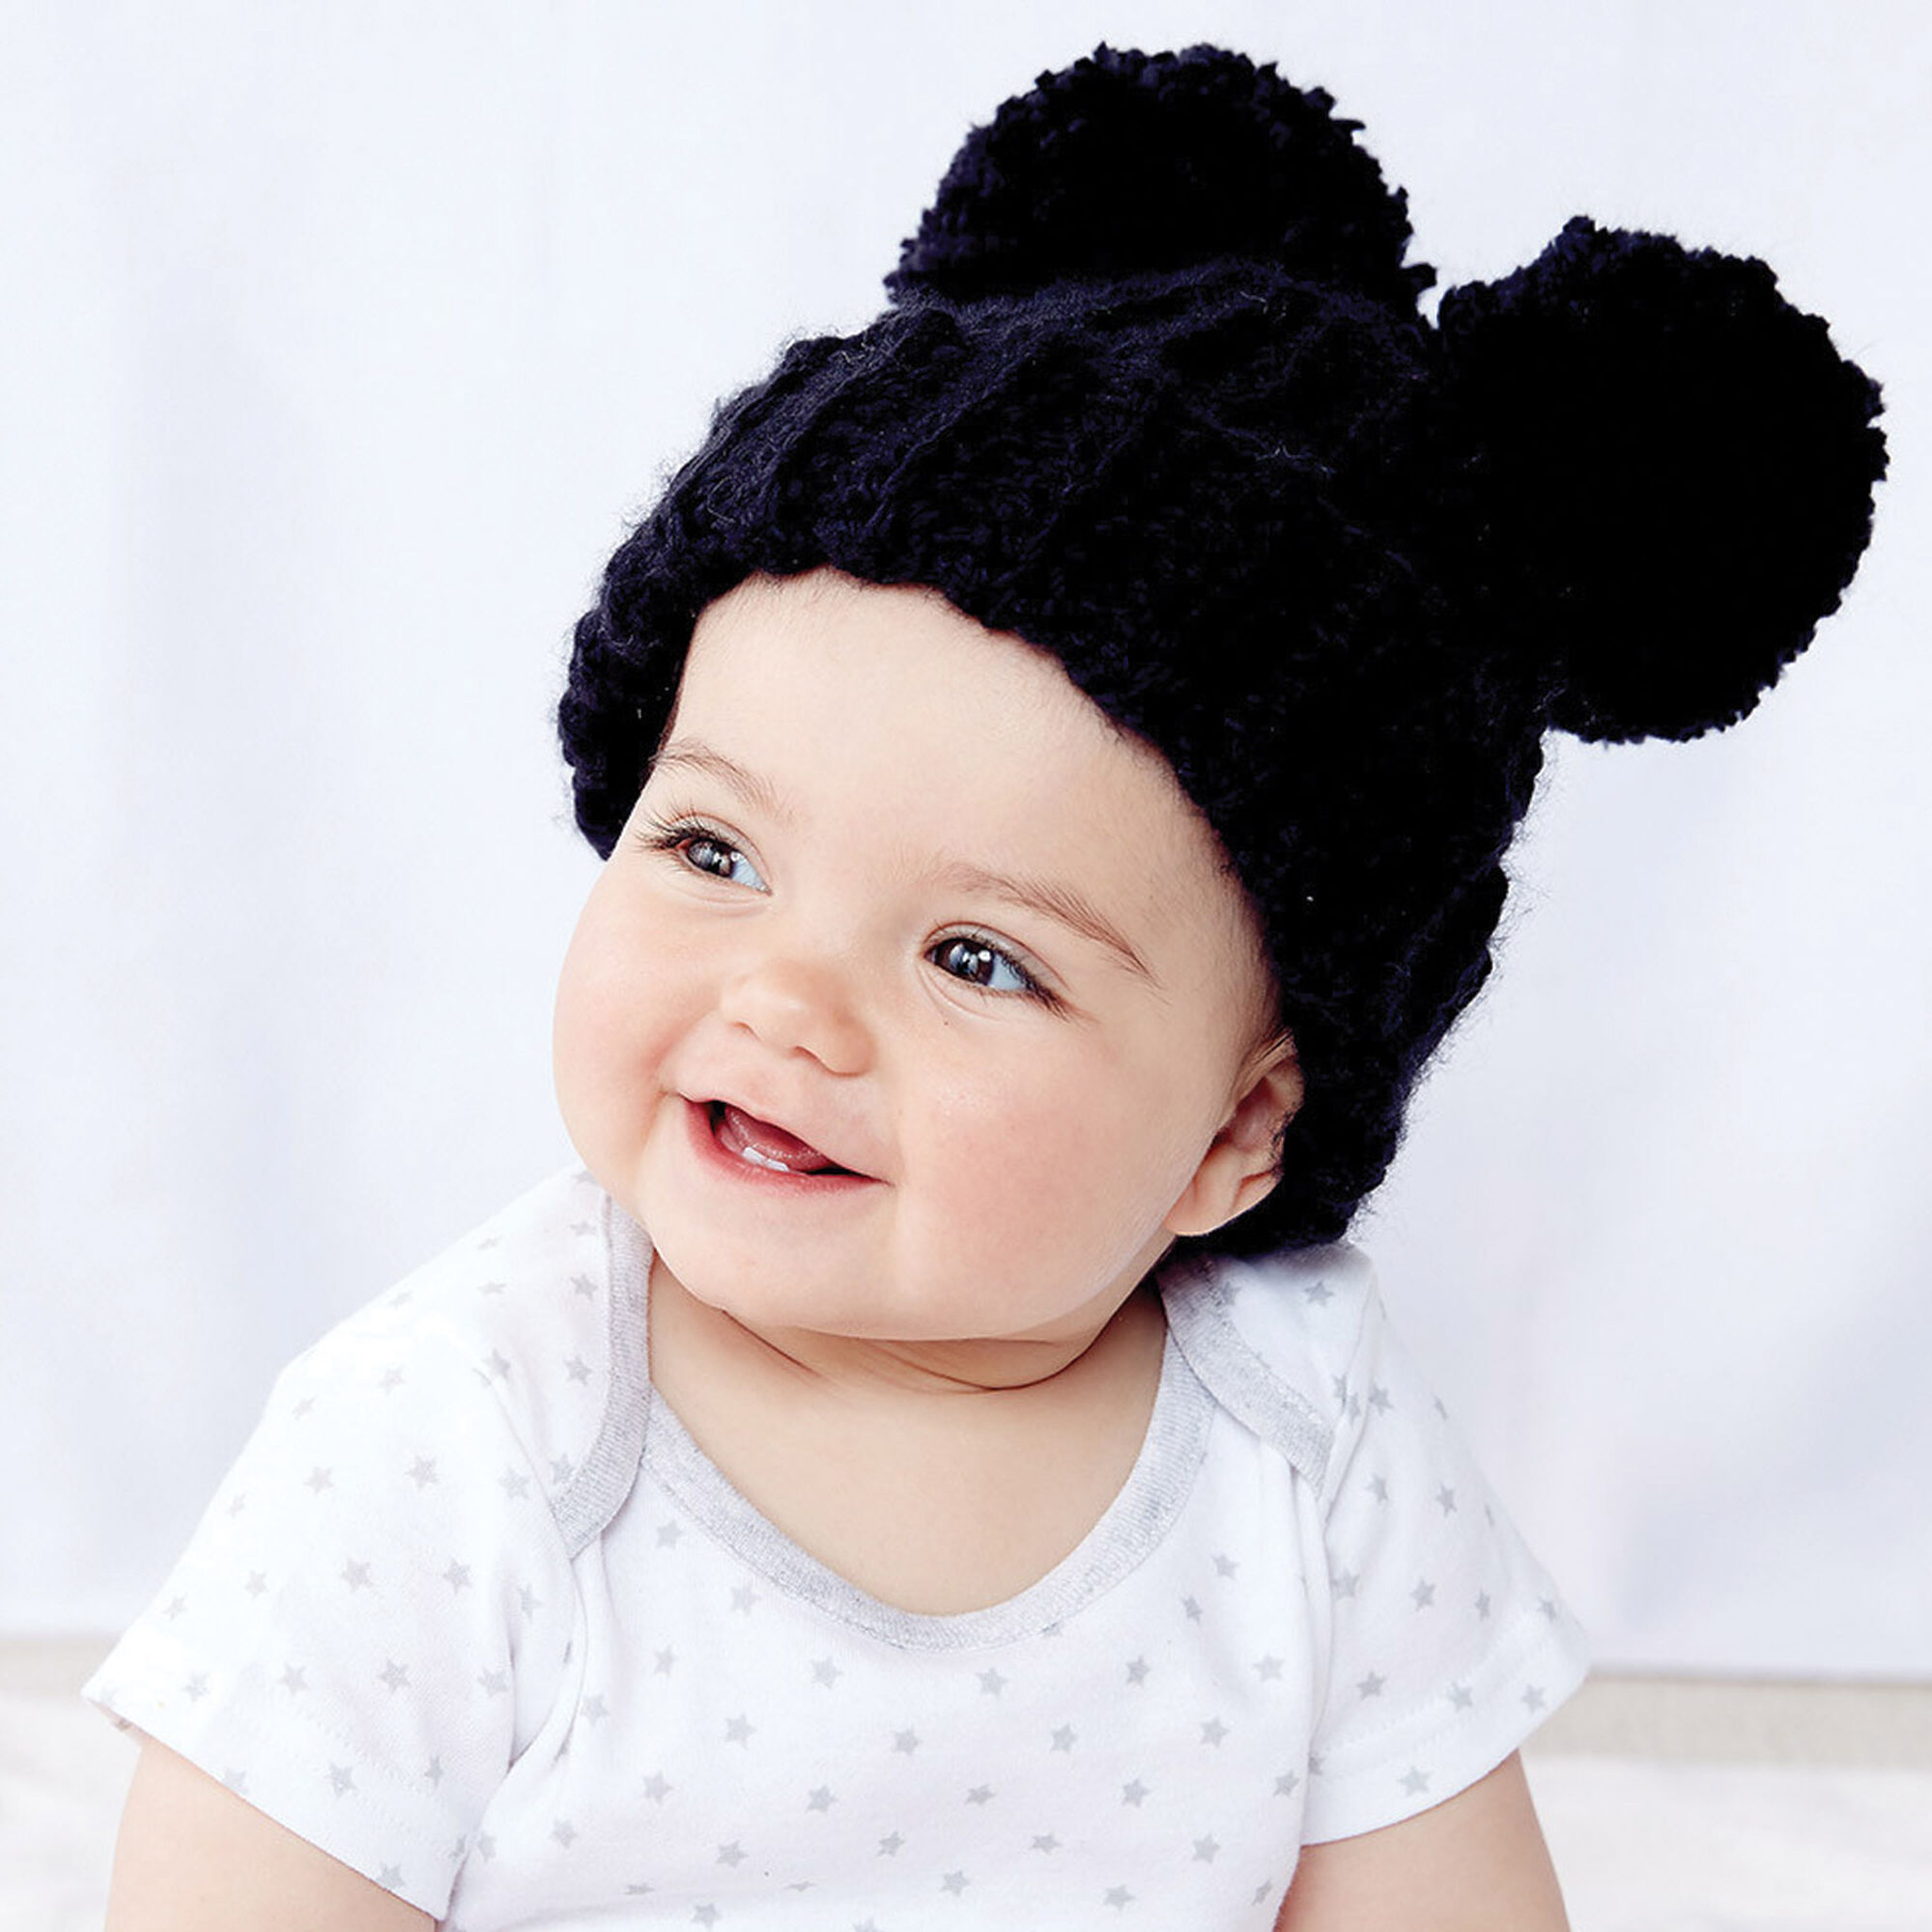 Bernat Adorable Pompom Crochet Hat Version 1 6 12 Mos